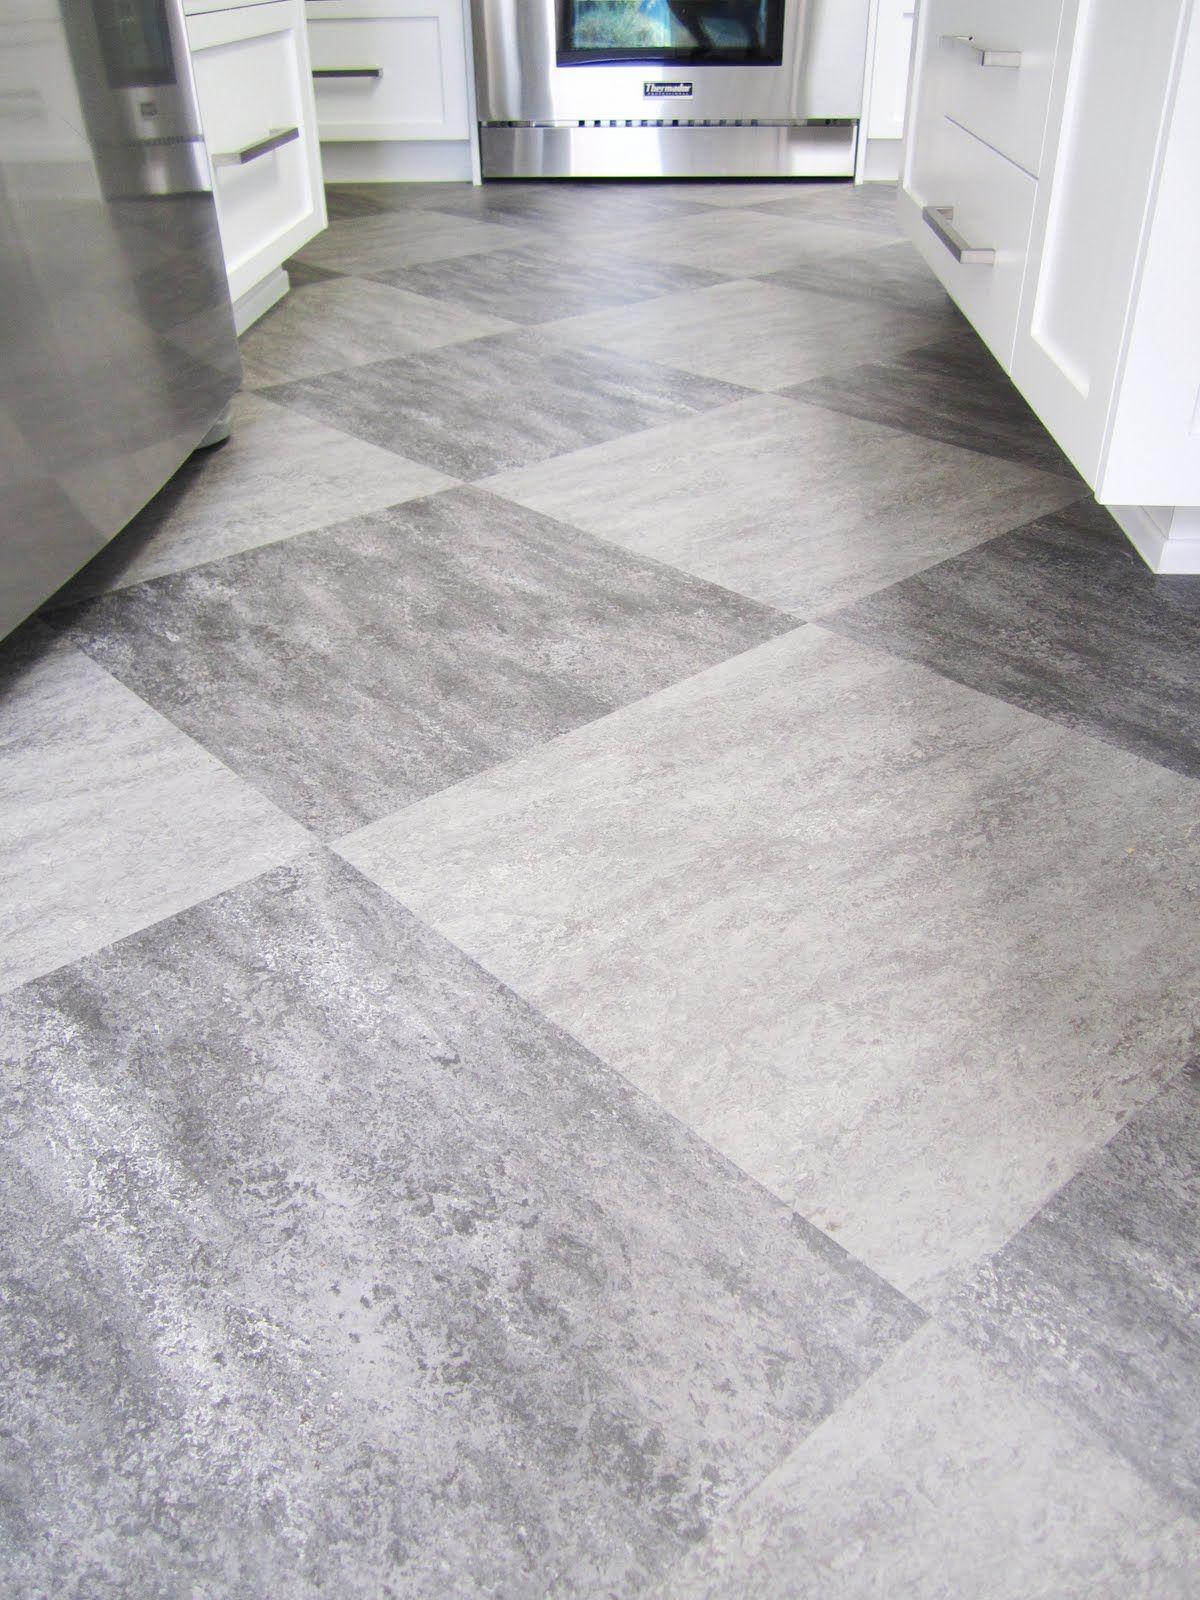 kitchen tile floors harlequin tile floors harlequin of grey on grey tiles is used on the